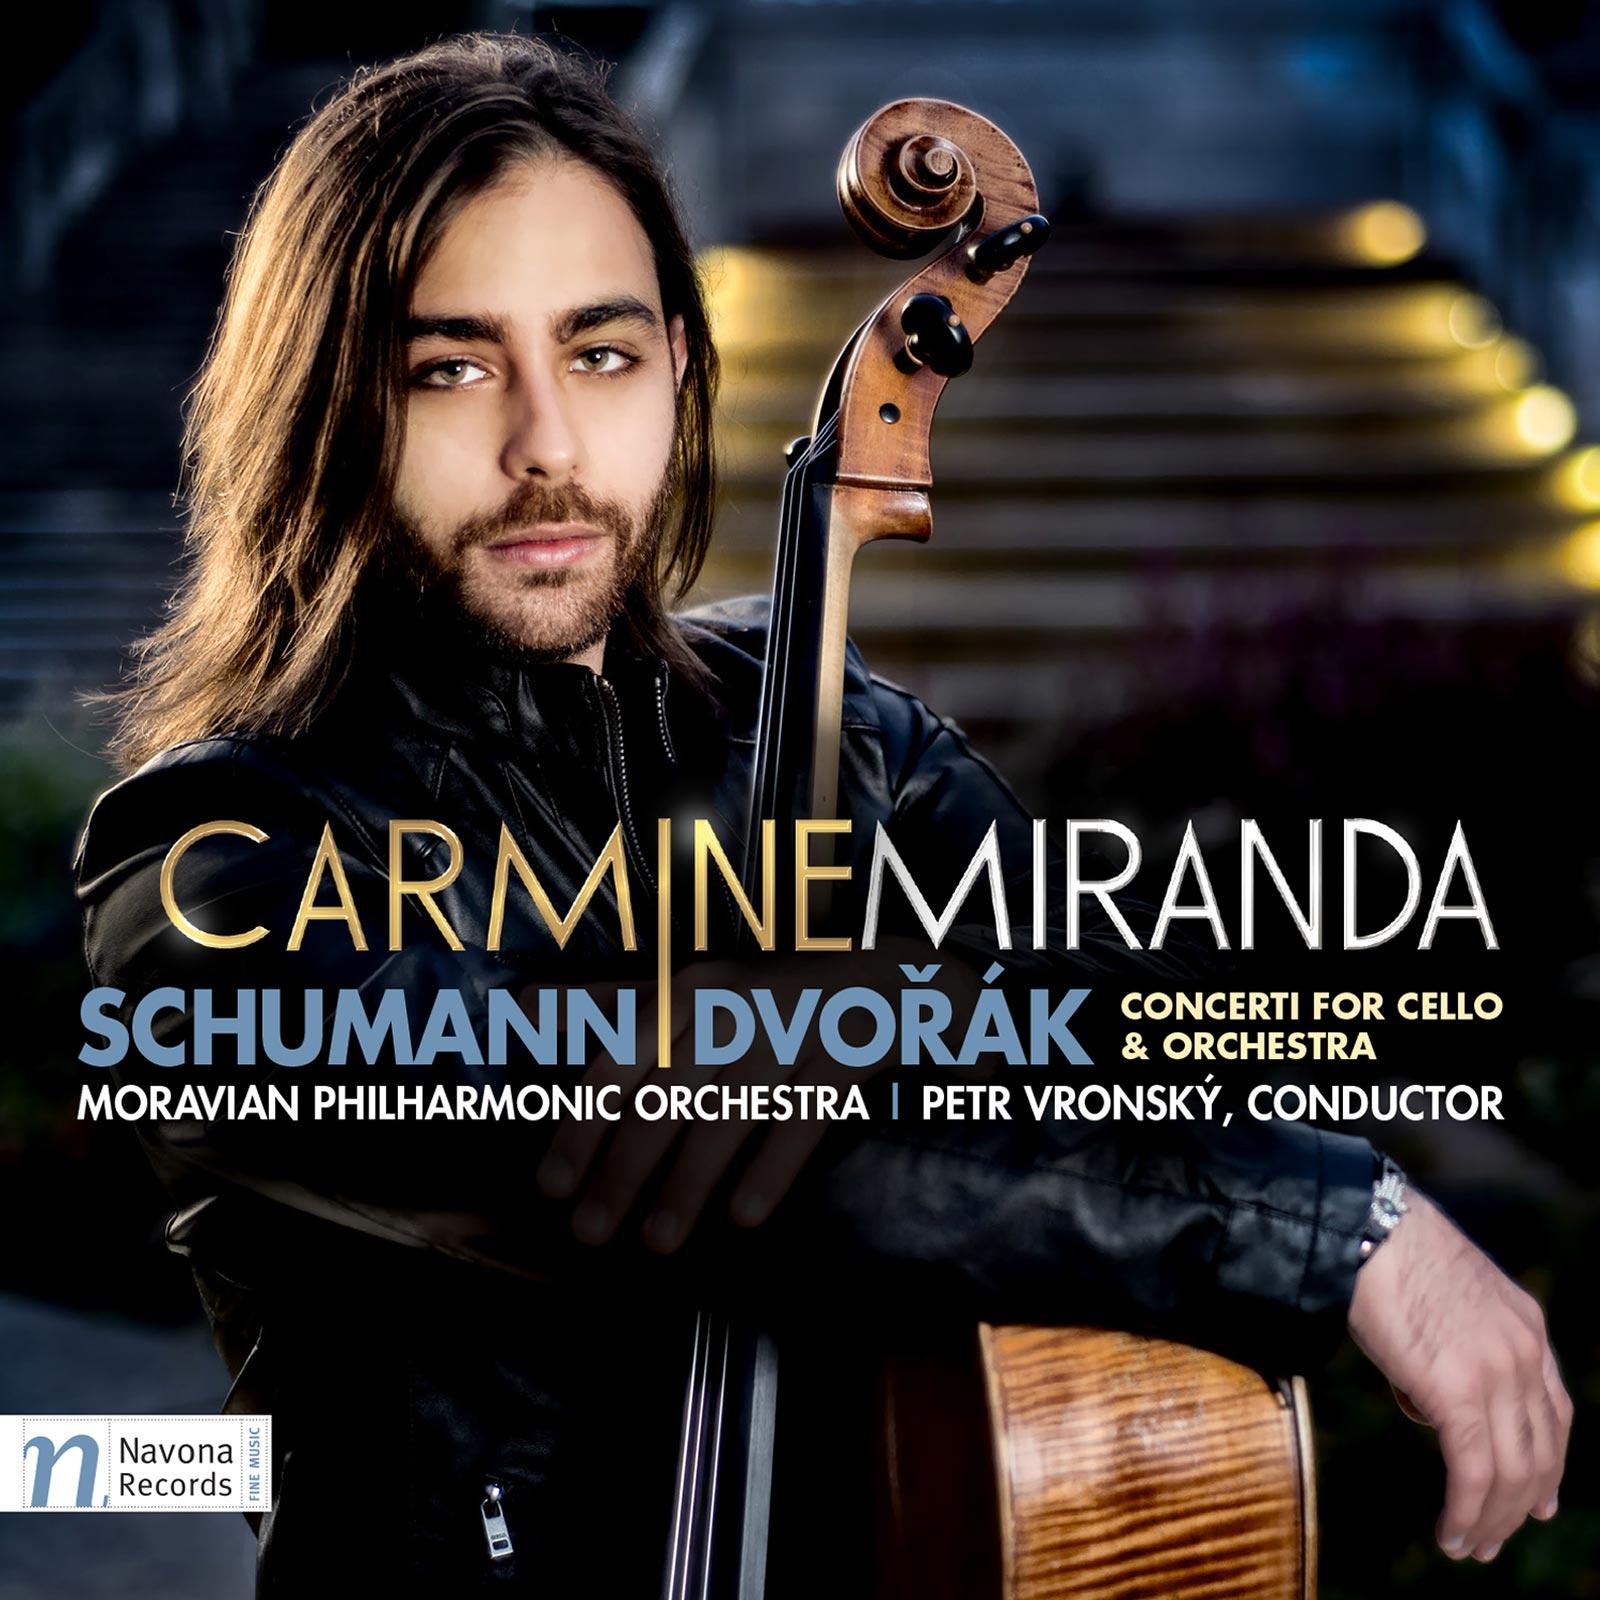 Schumann | Dvořák: Concerti For Cello & Orchestra